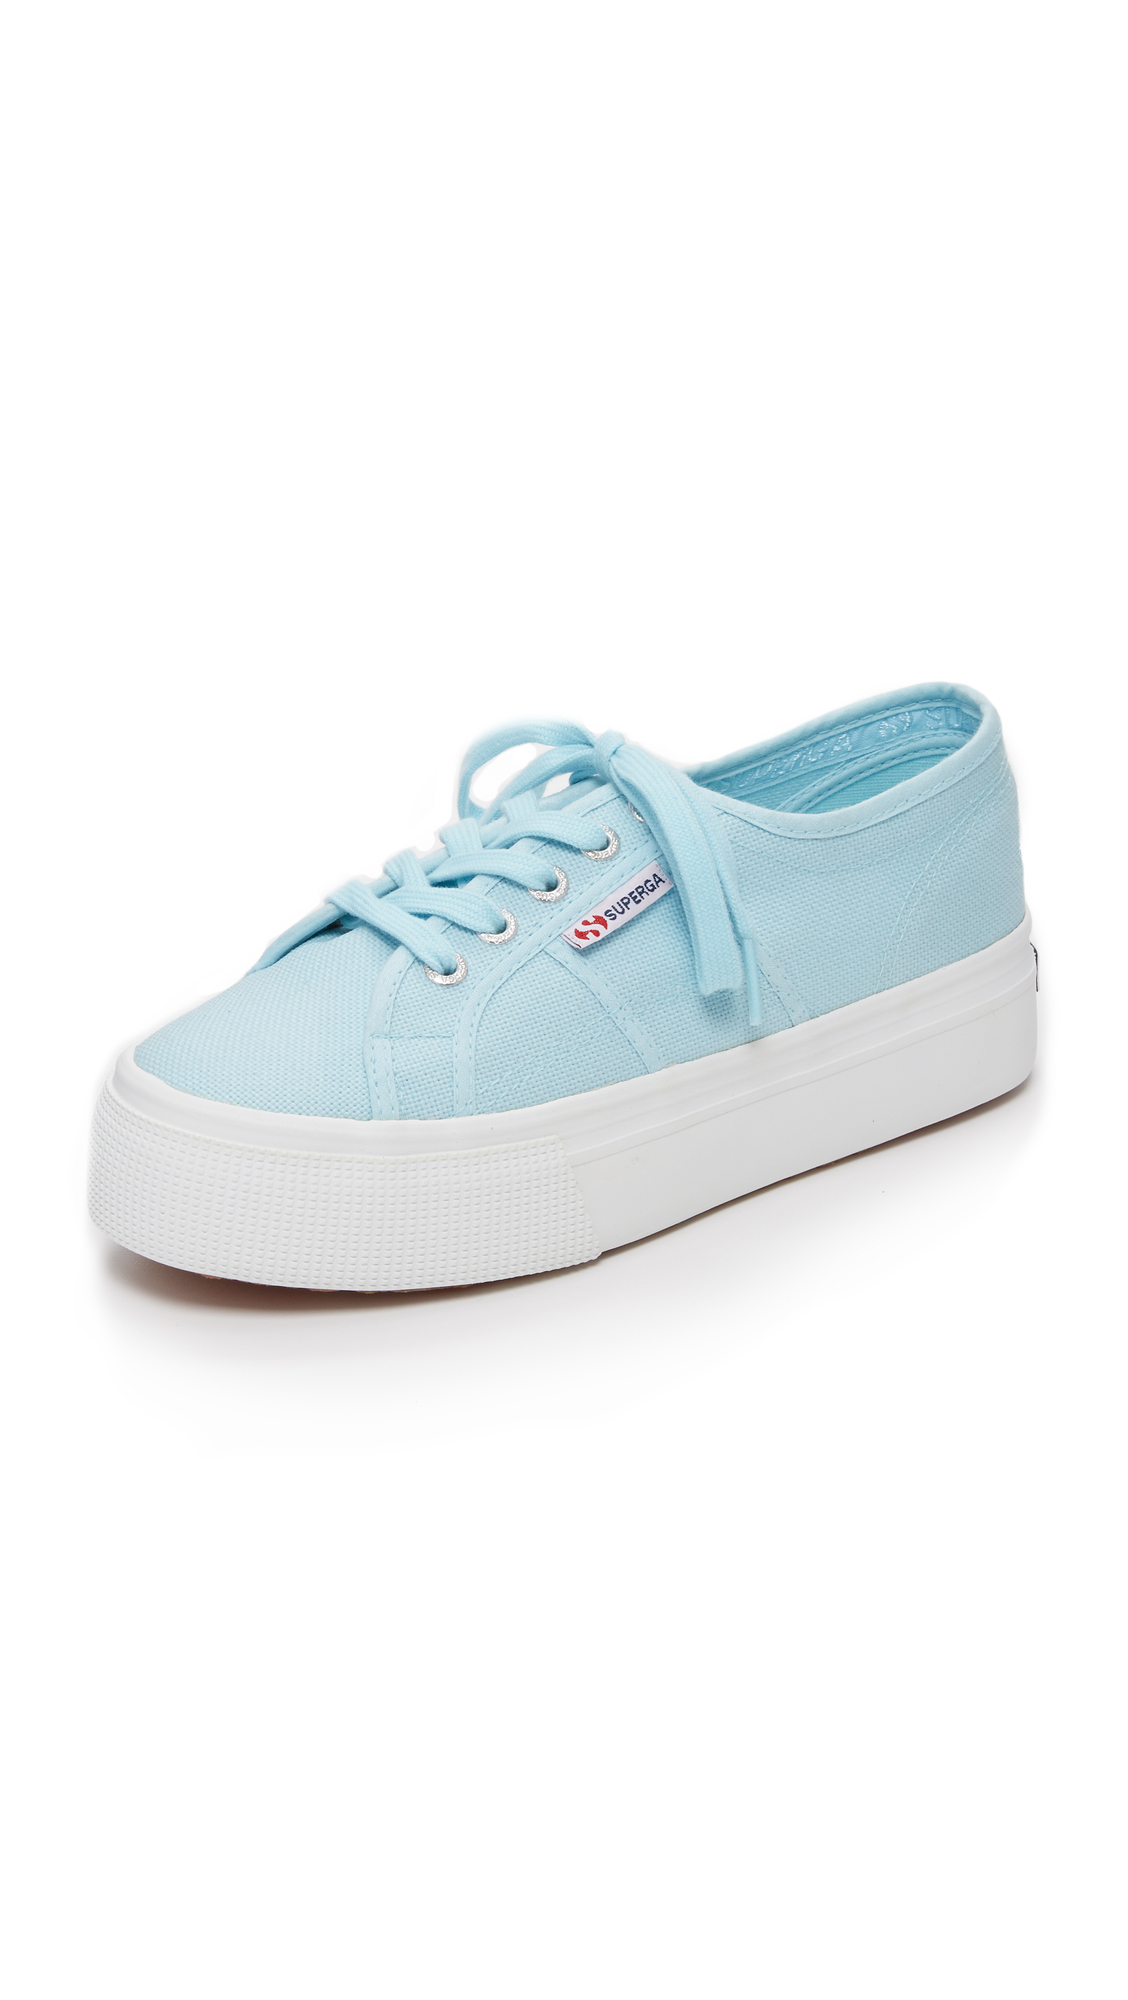 7d7174be464 Lyst - Superga 2790 Platform Sneakers in Blue